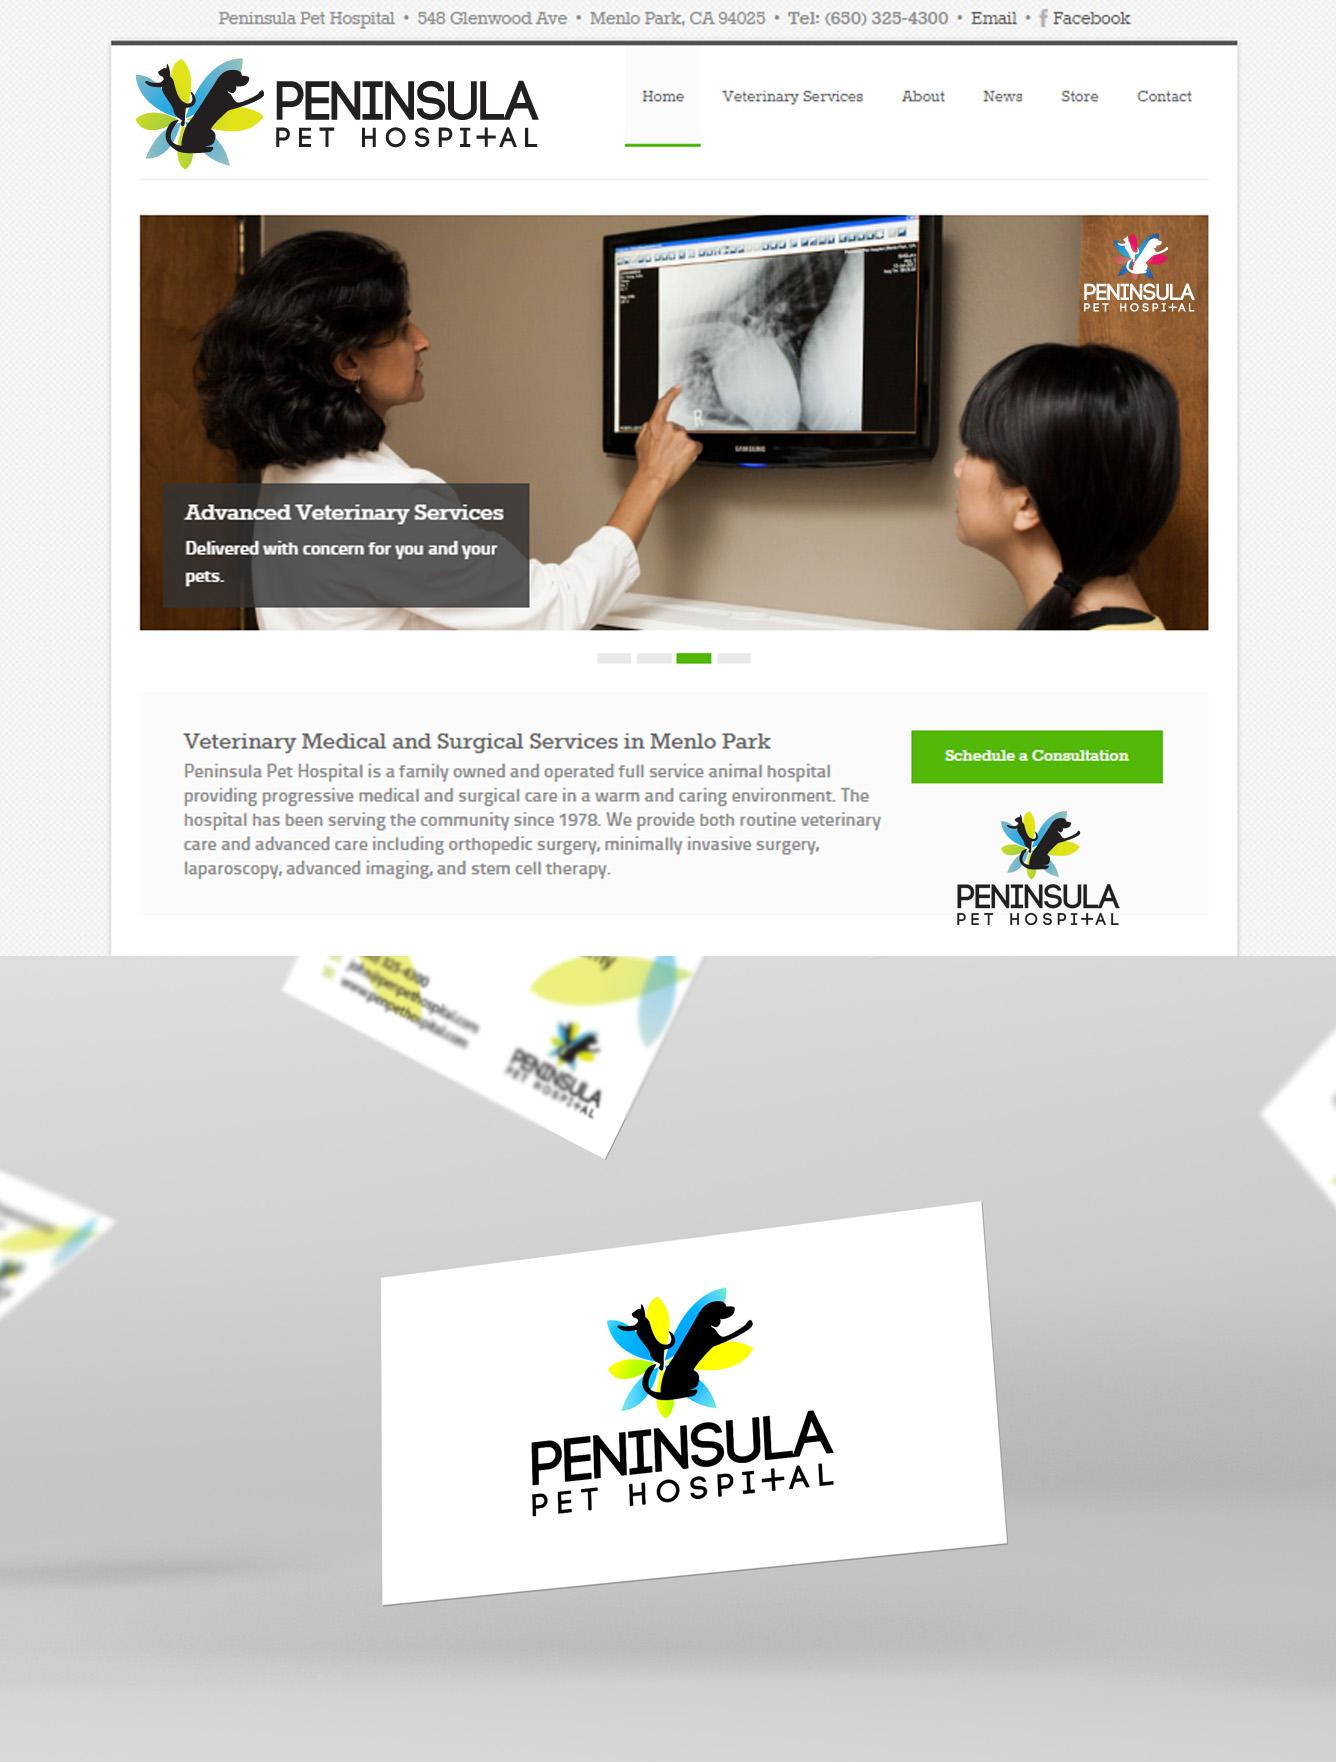 Logo Design by Manufaktura - Entry No. 96 in the Logo Design Contest Creative Logo Design for Peninsula Pet Hospital.